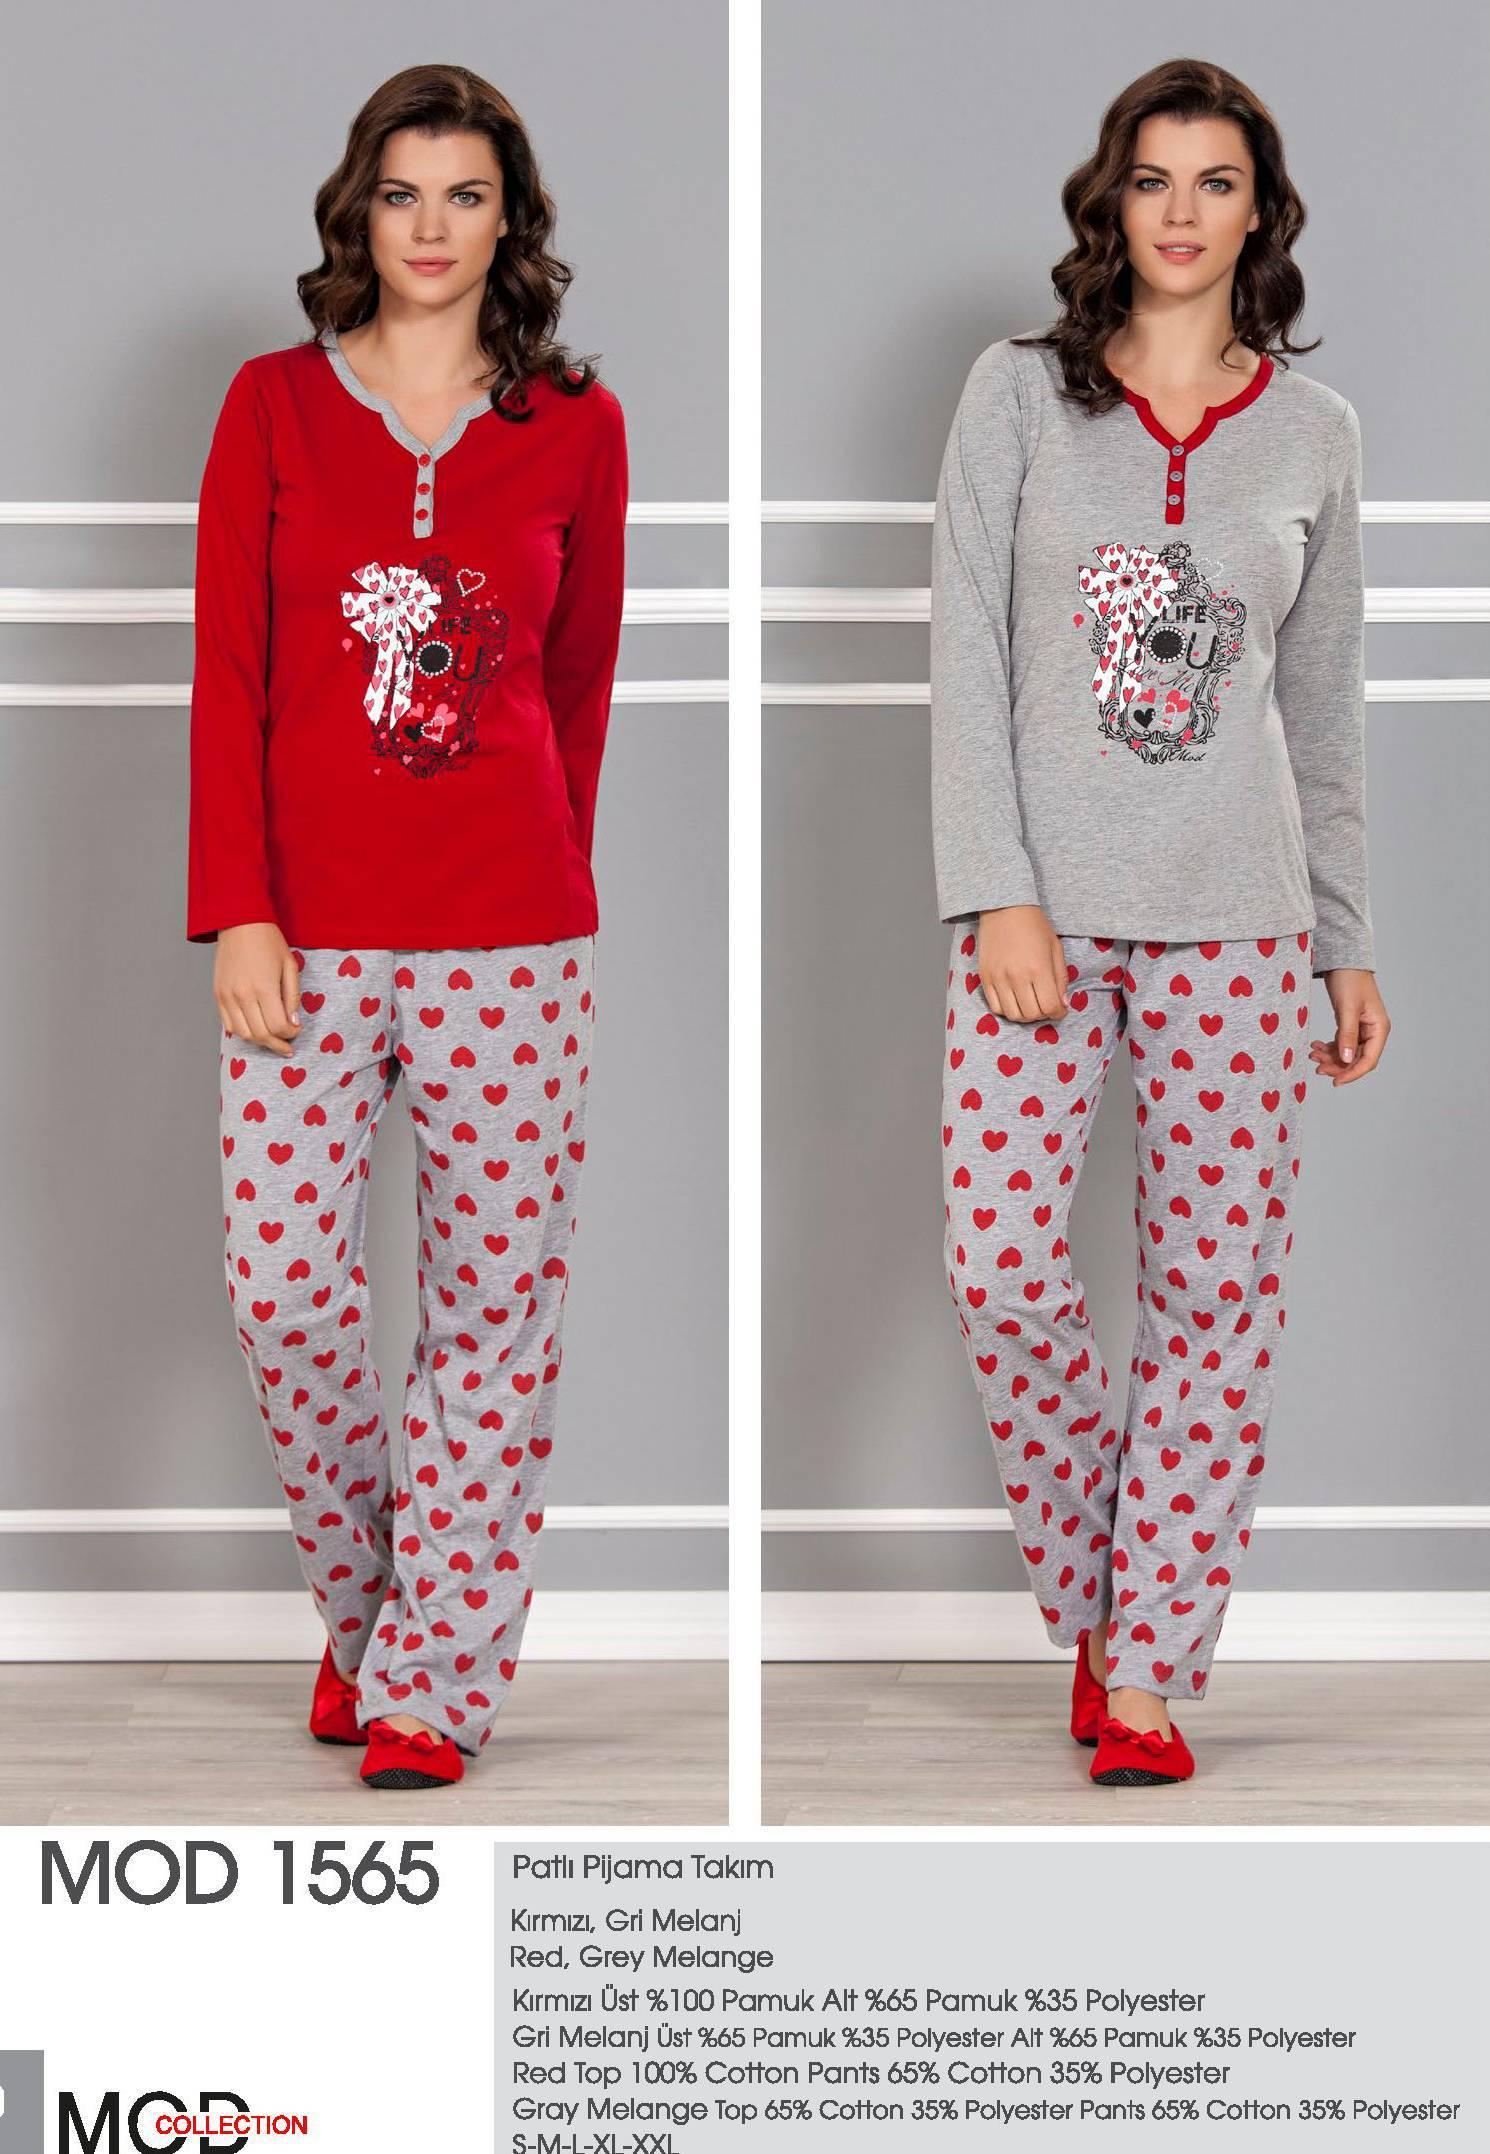 Mod Collection Bayan Patlı Pijama Takım 1565